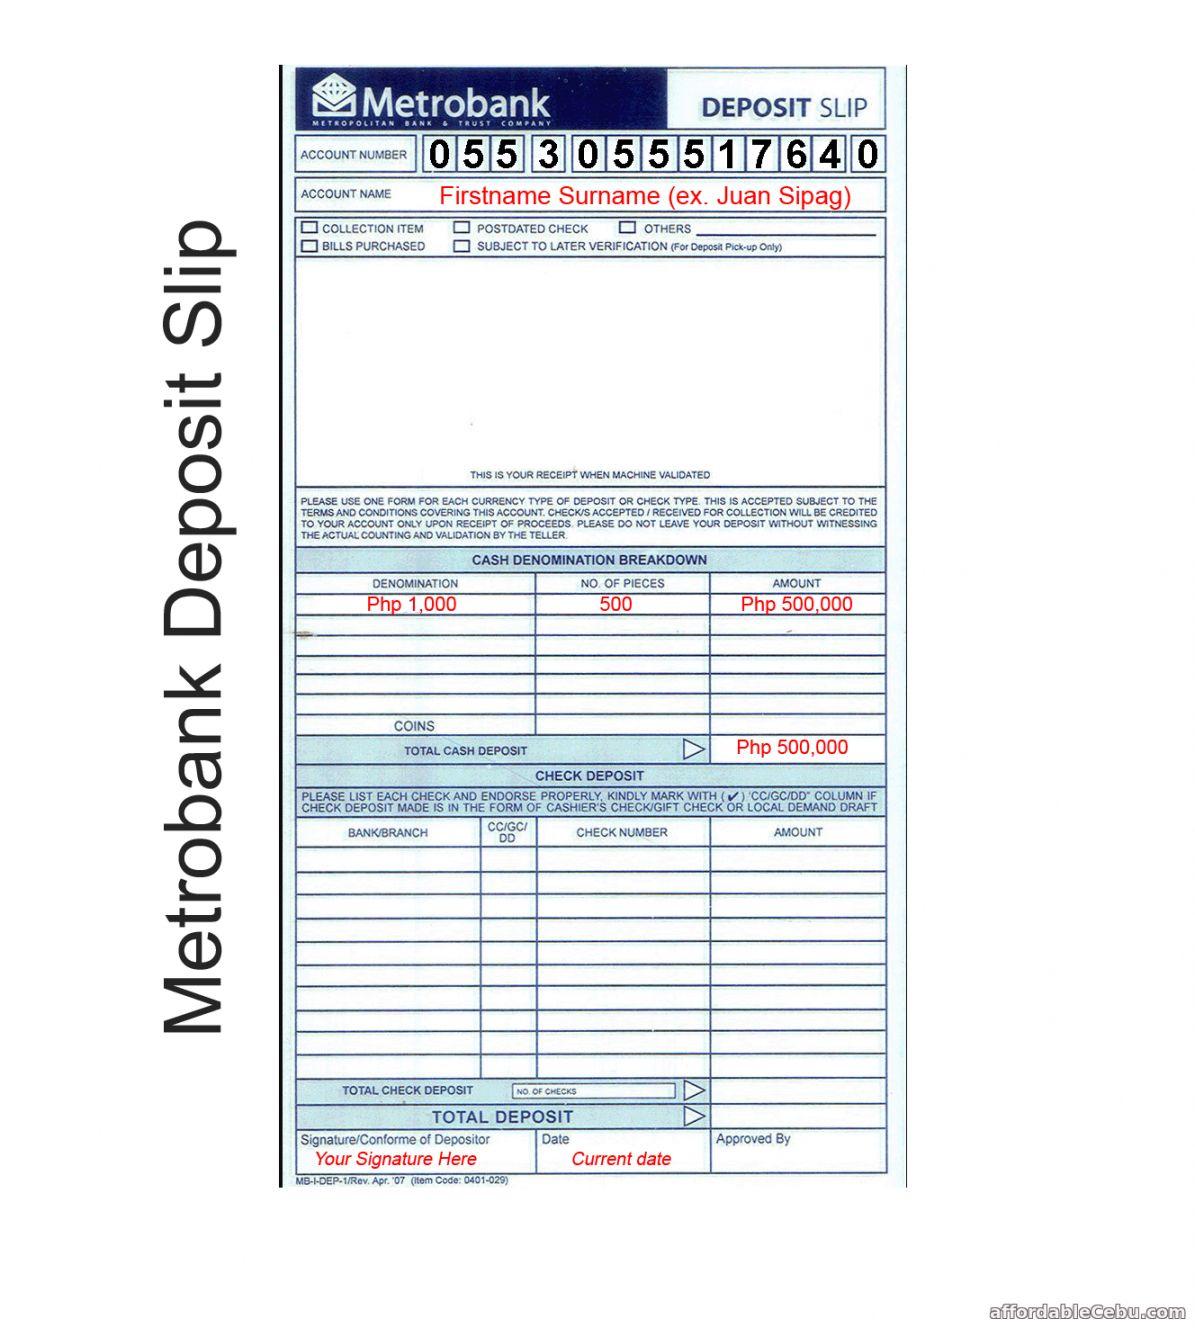 Get Our Sample Of Cash Deposit Slip Template For Free Deposit Slip Templates